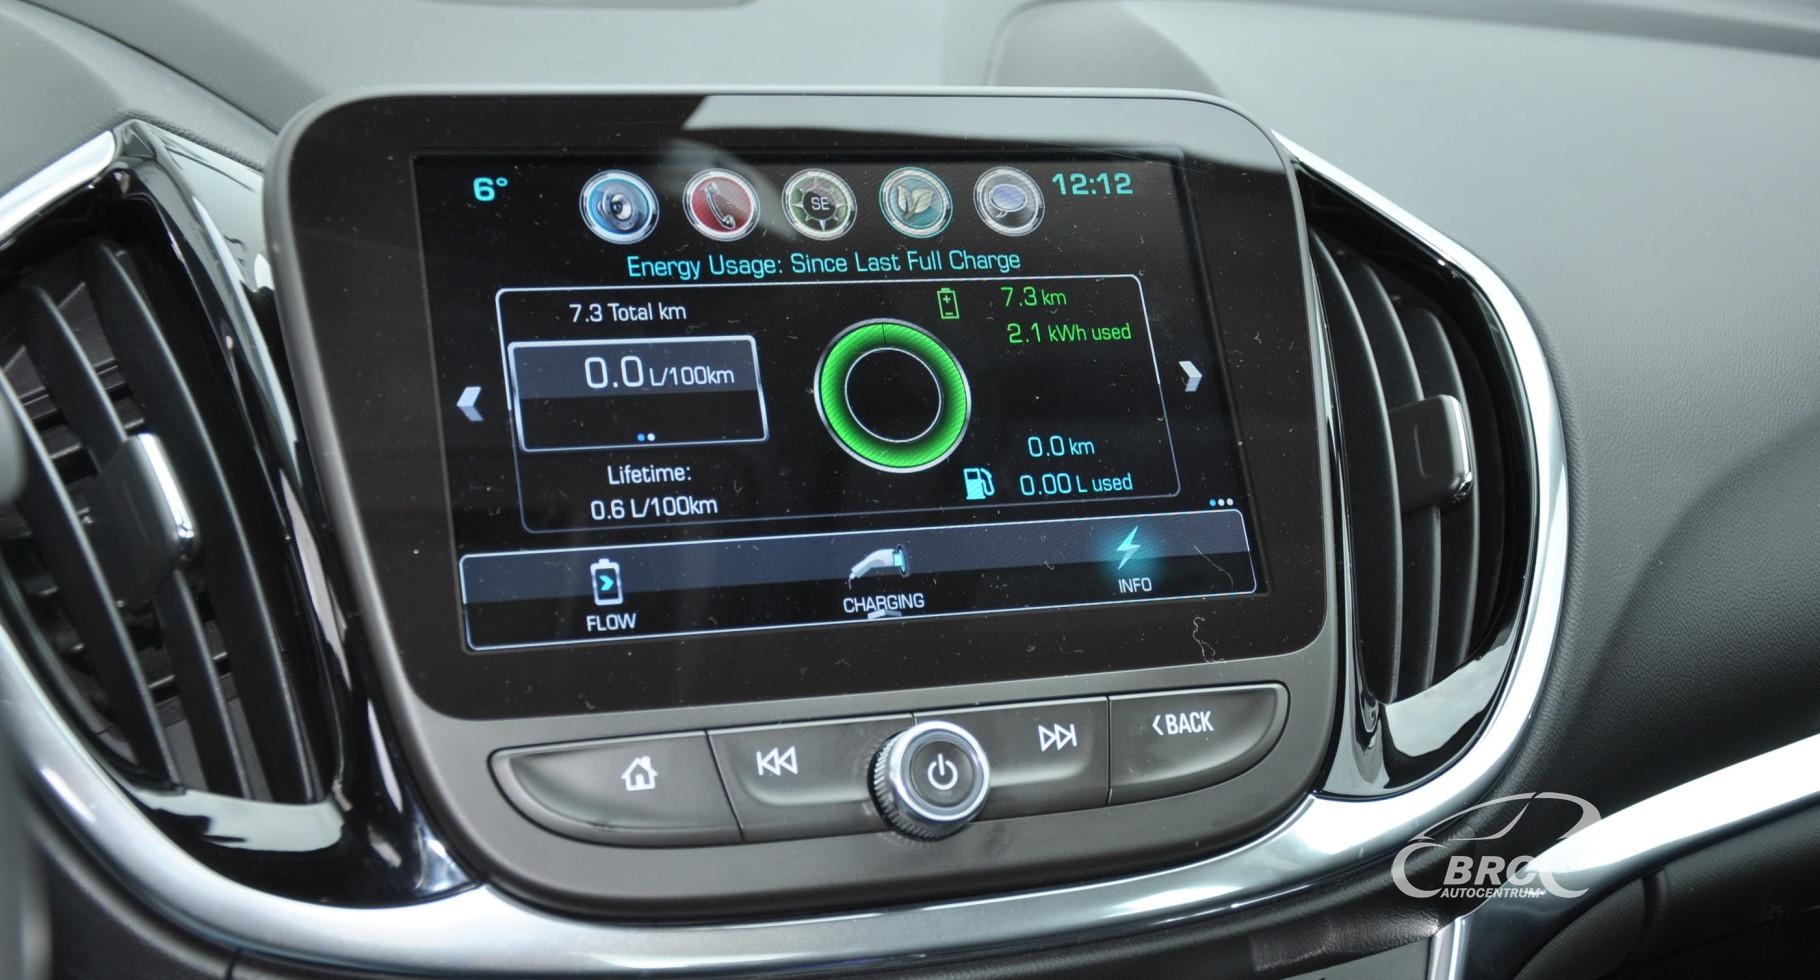 Chevrolet Volt 1.5 Plug-In Hybrid Automatas